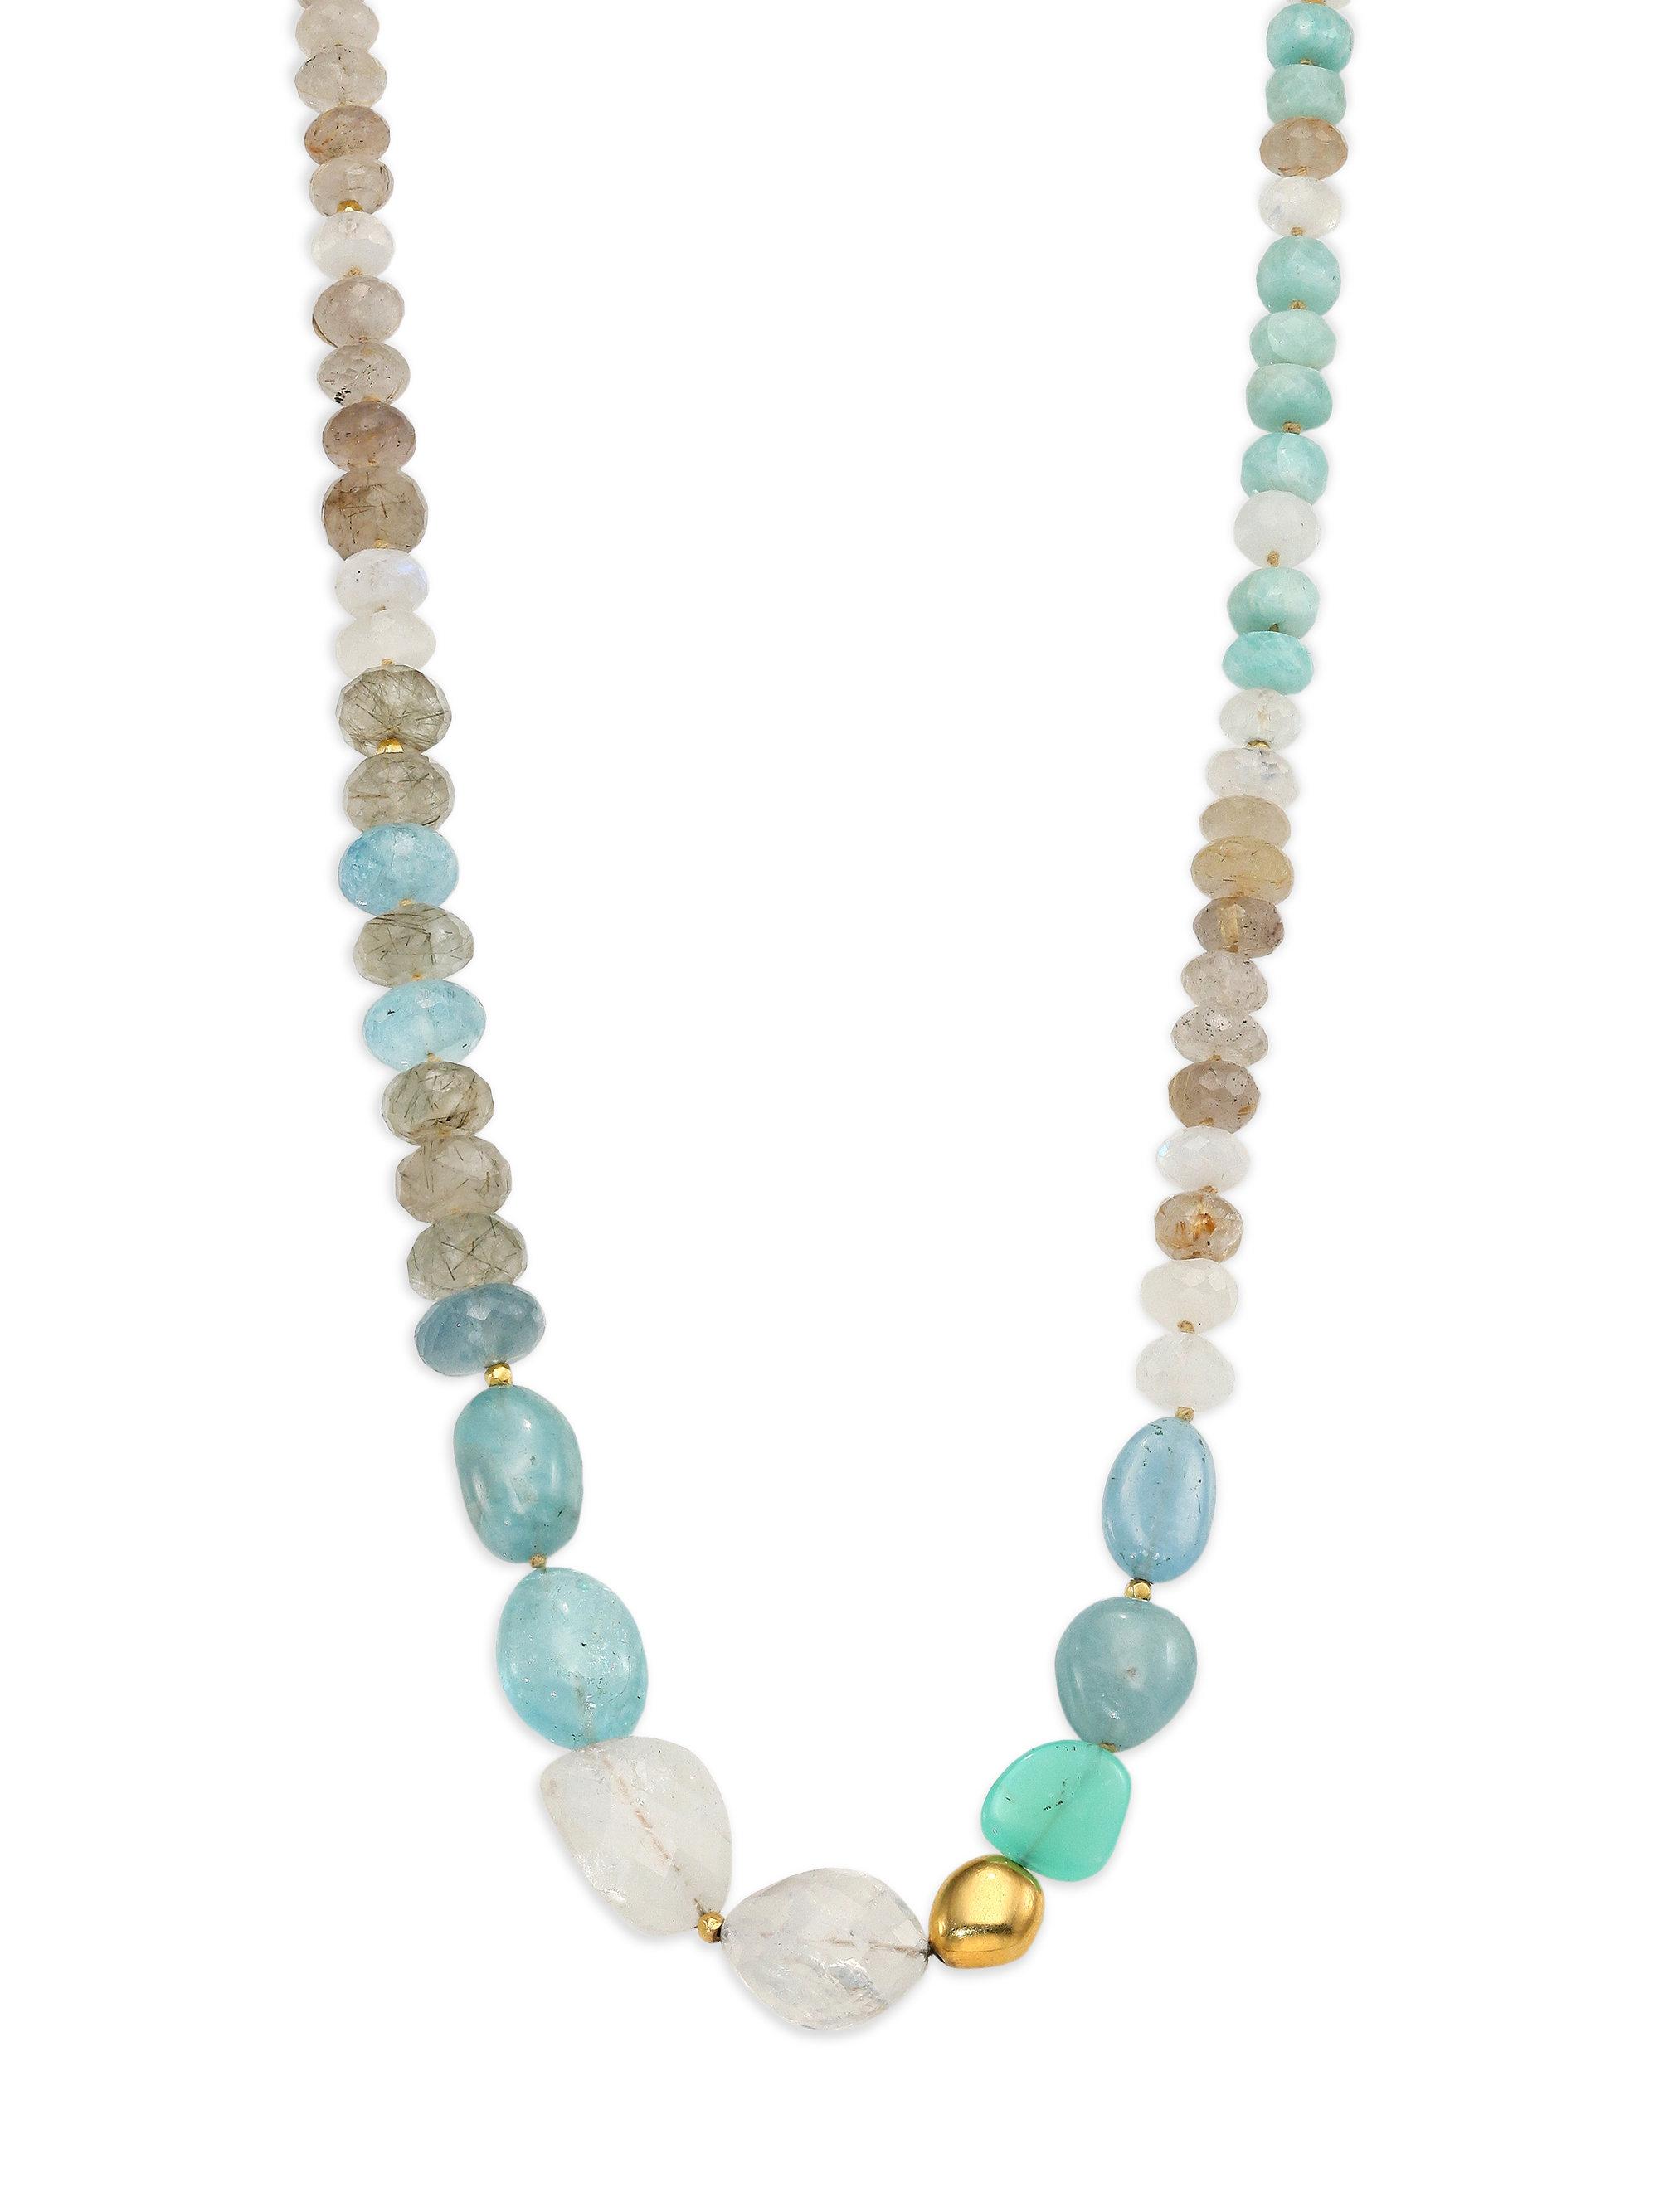 Lena skadegard Dunna Terra Semi-precious Multi-stone & 18k ...